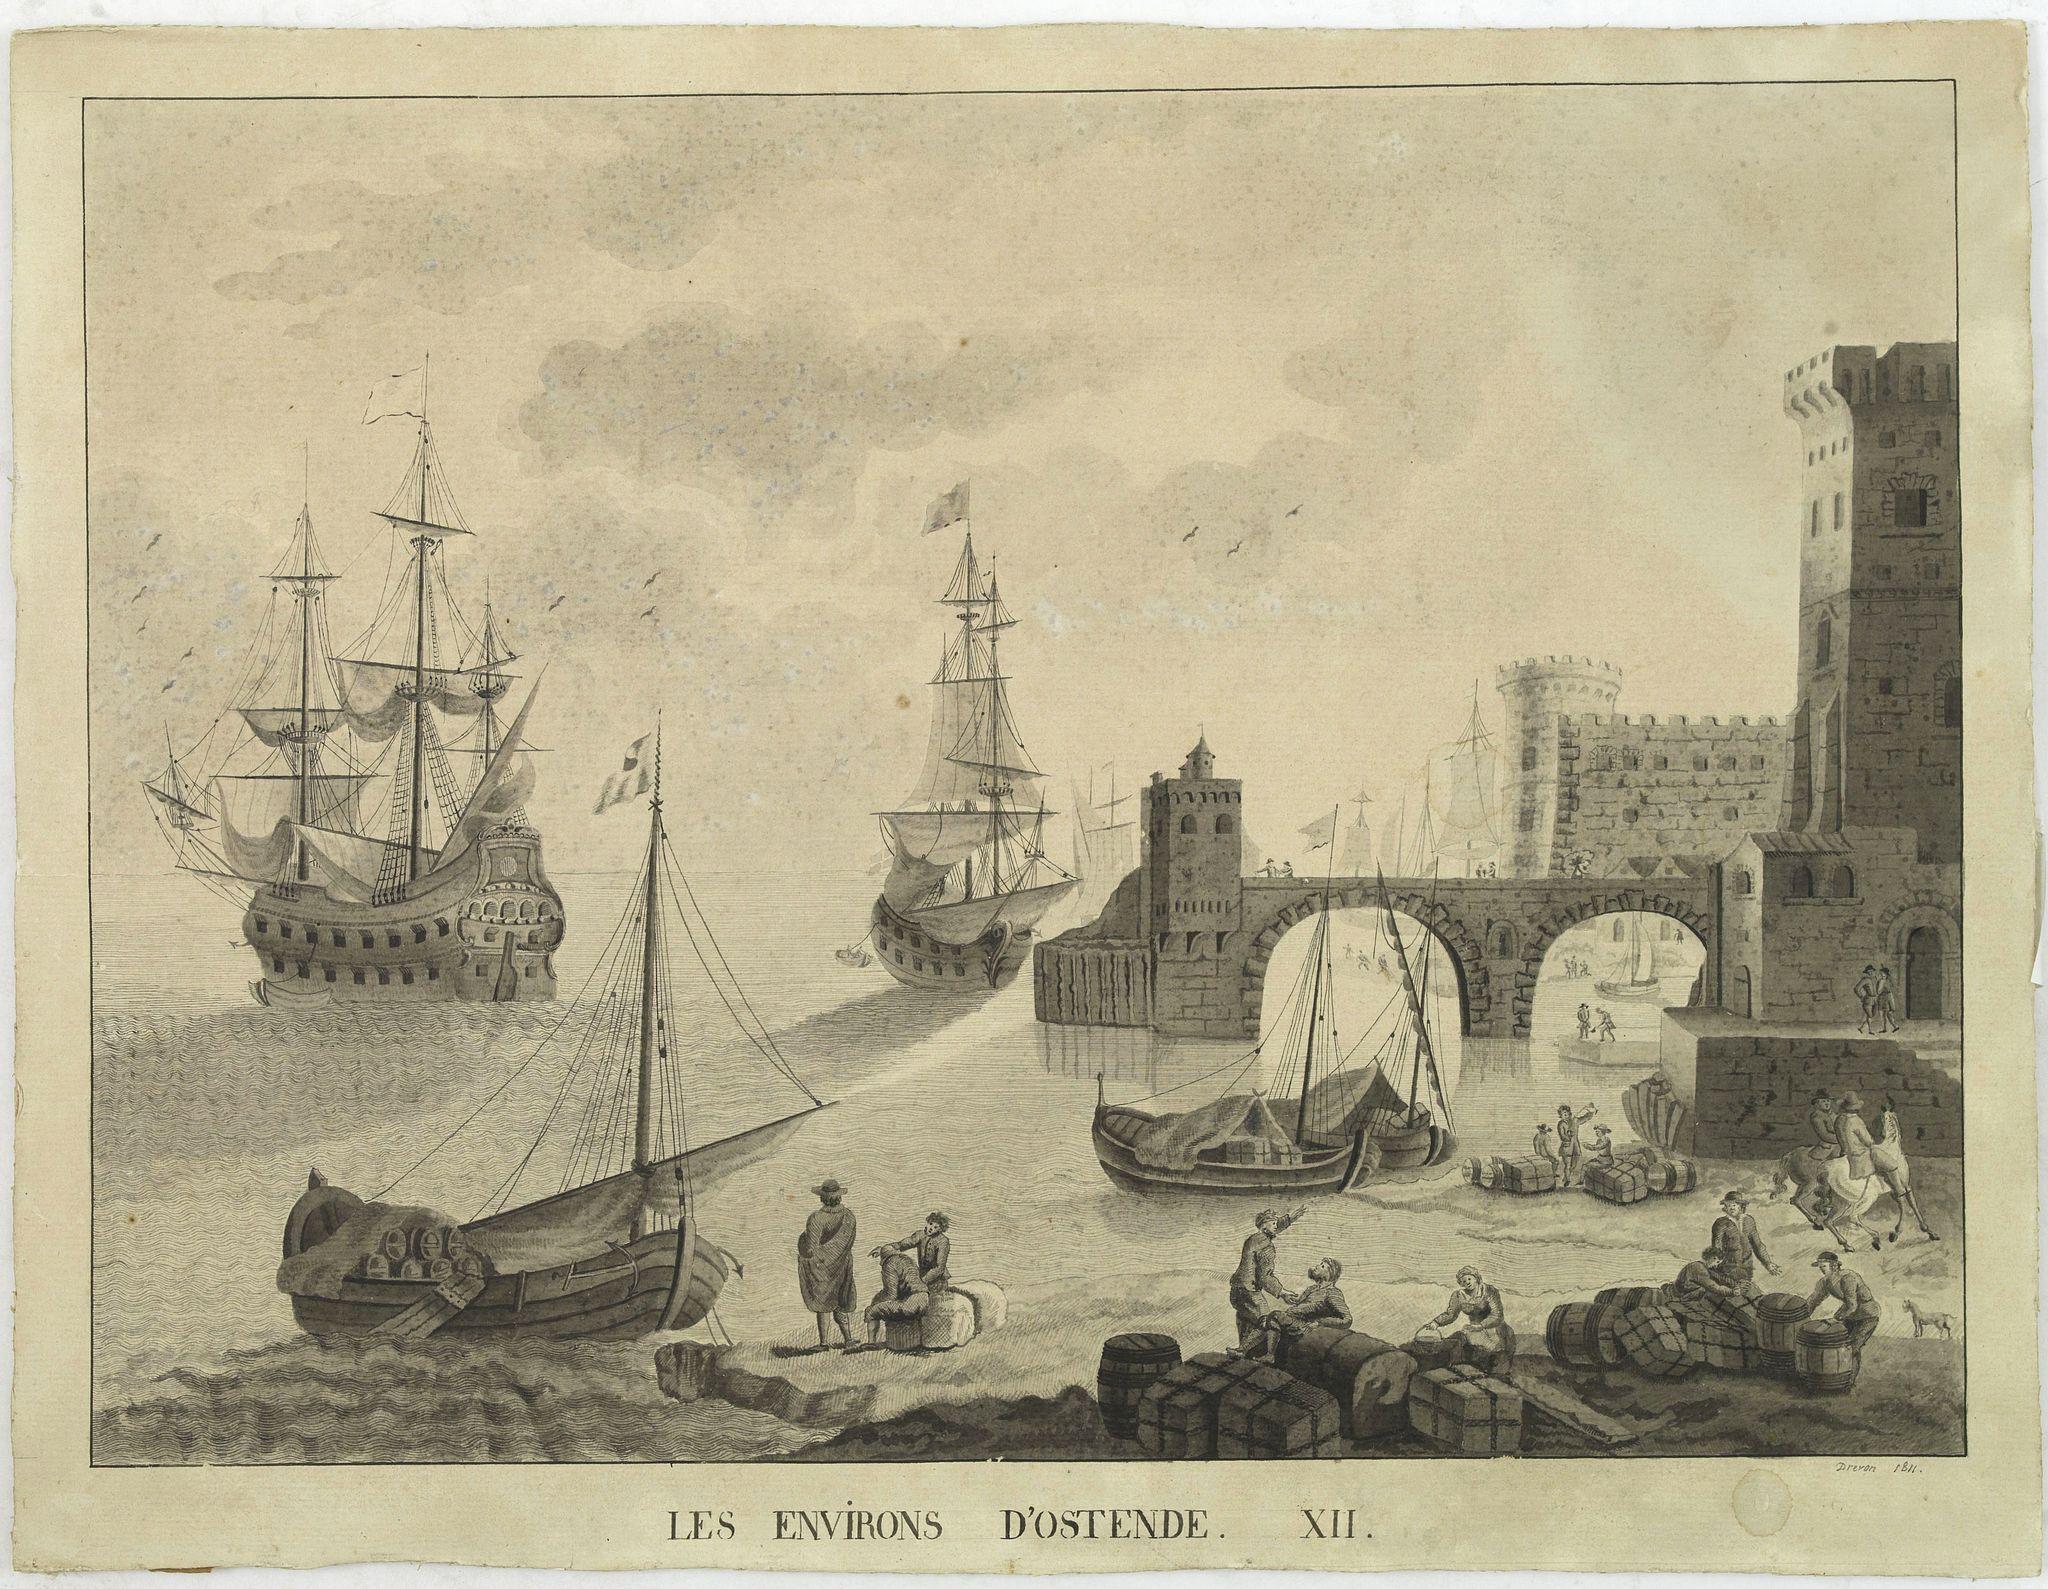 DREVON -  Les environs d'Ostende. XII.